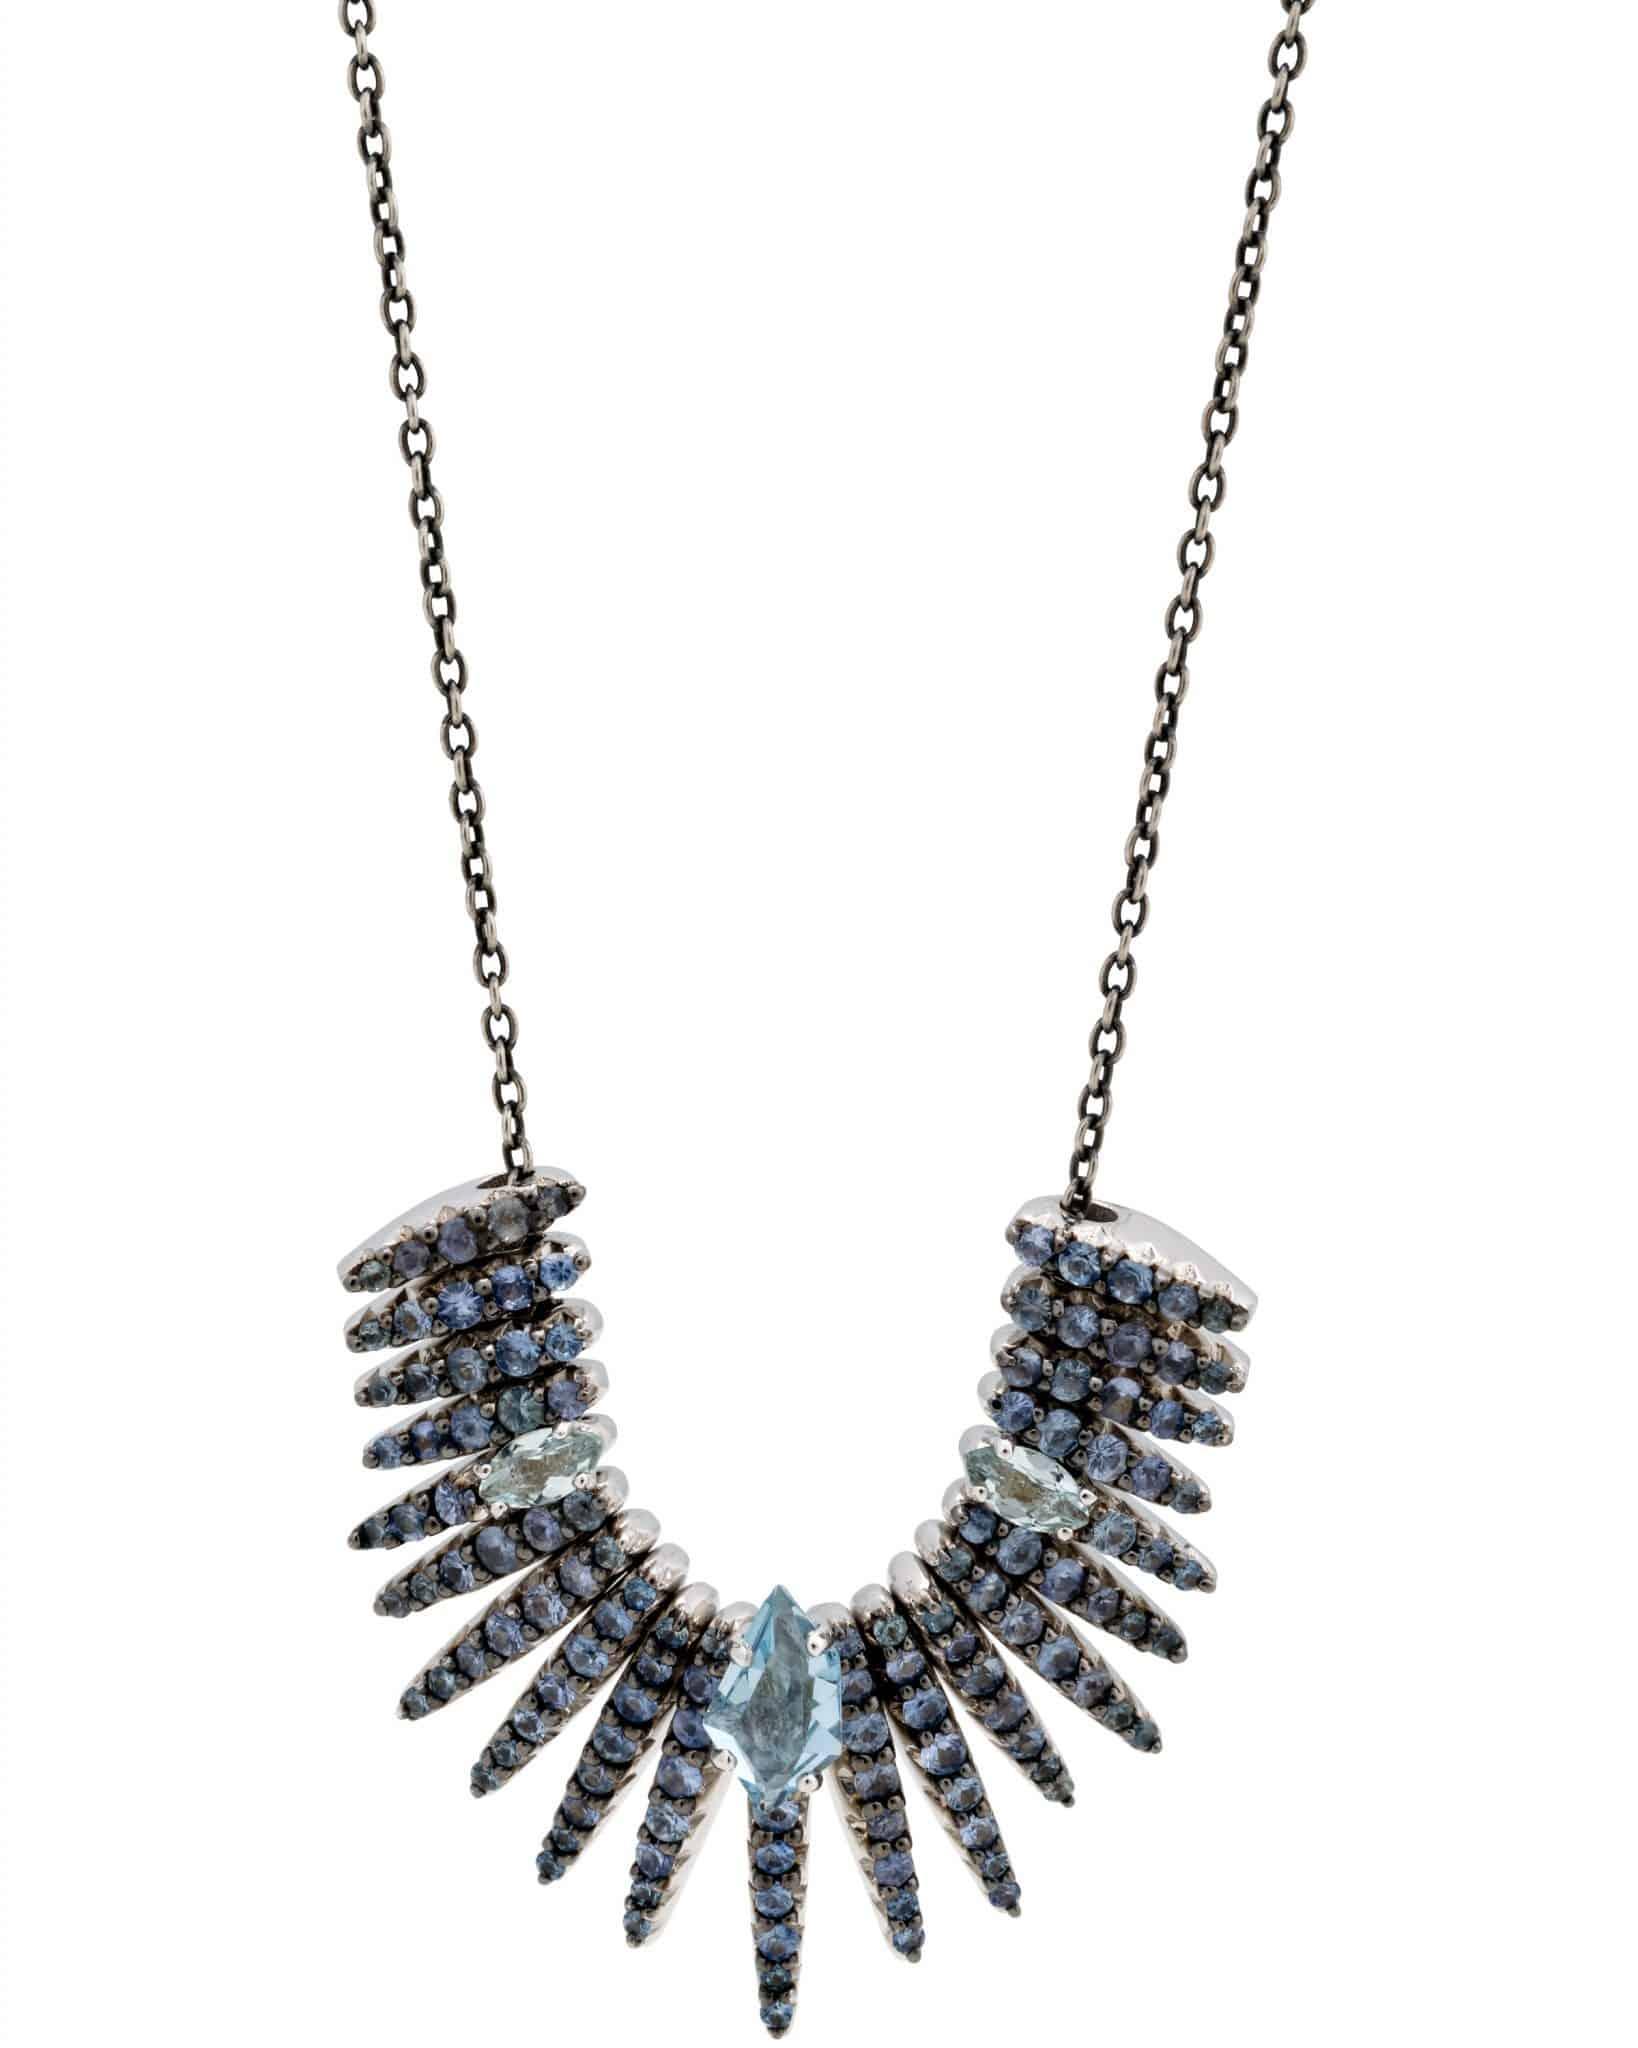 ALEXIS BITTAR – Quartz Kites And Blue Sapphire Necklace